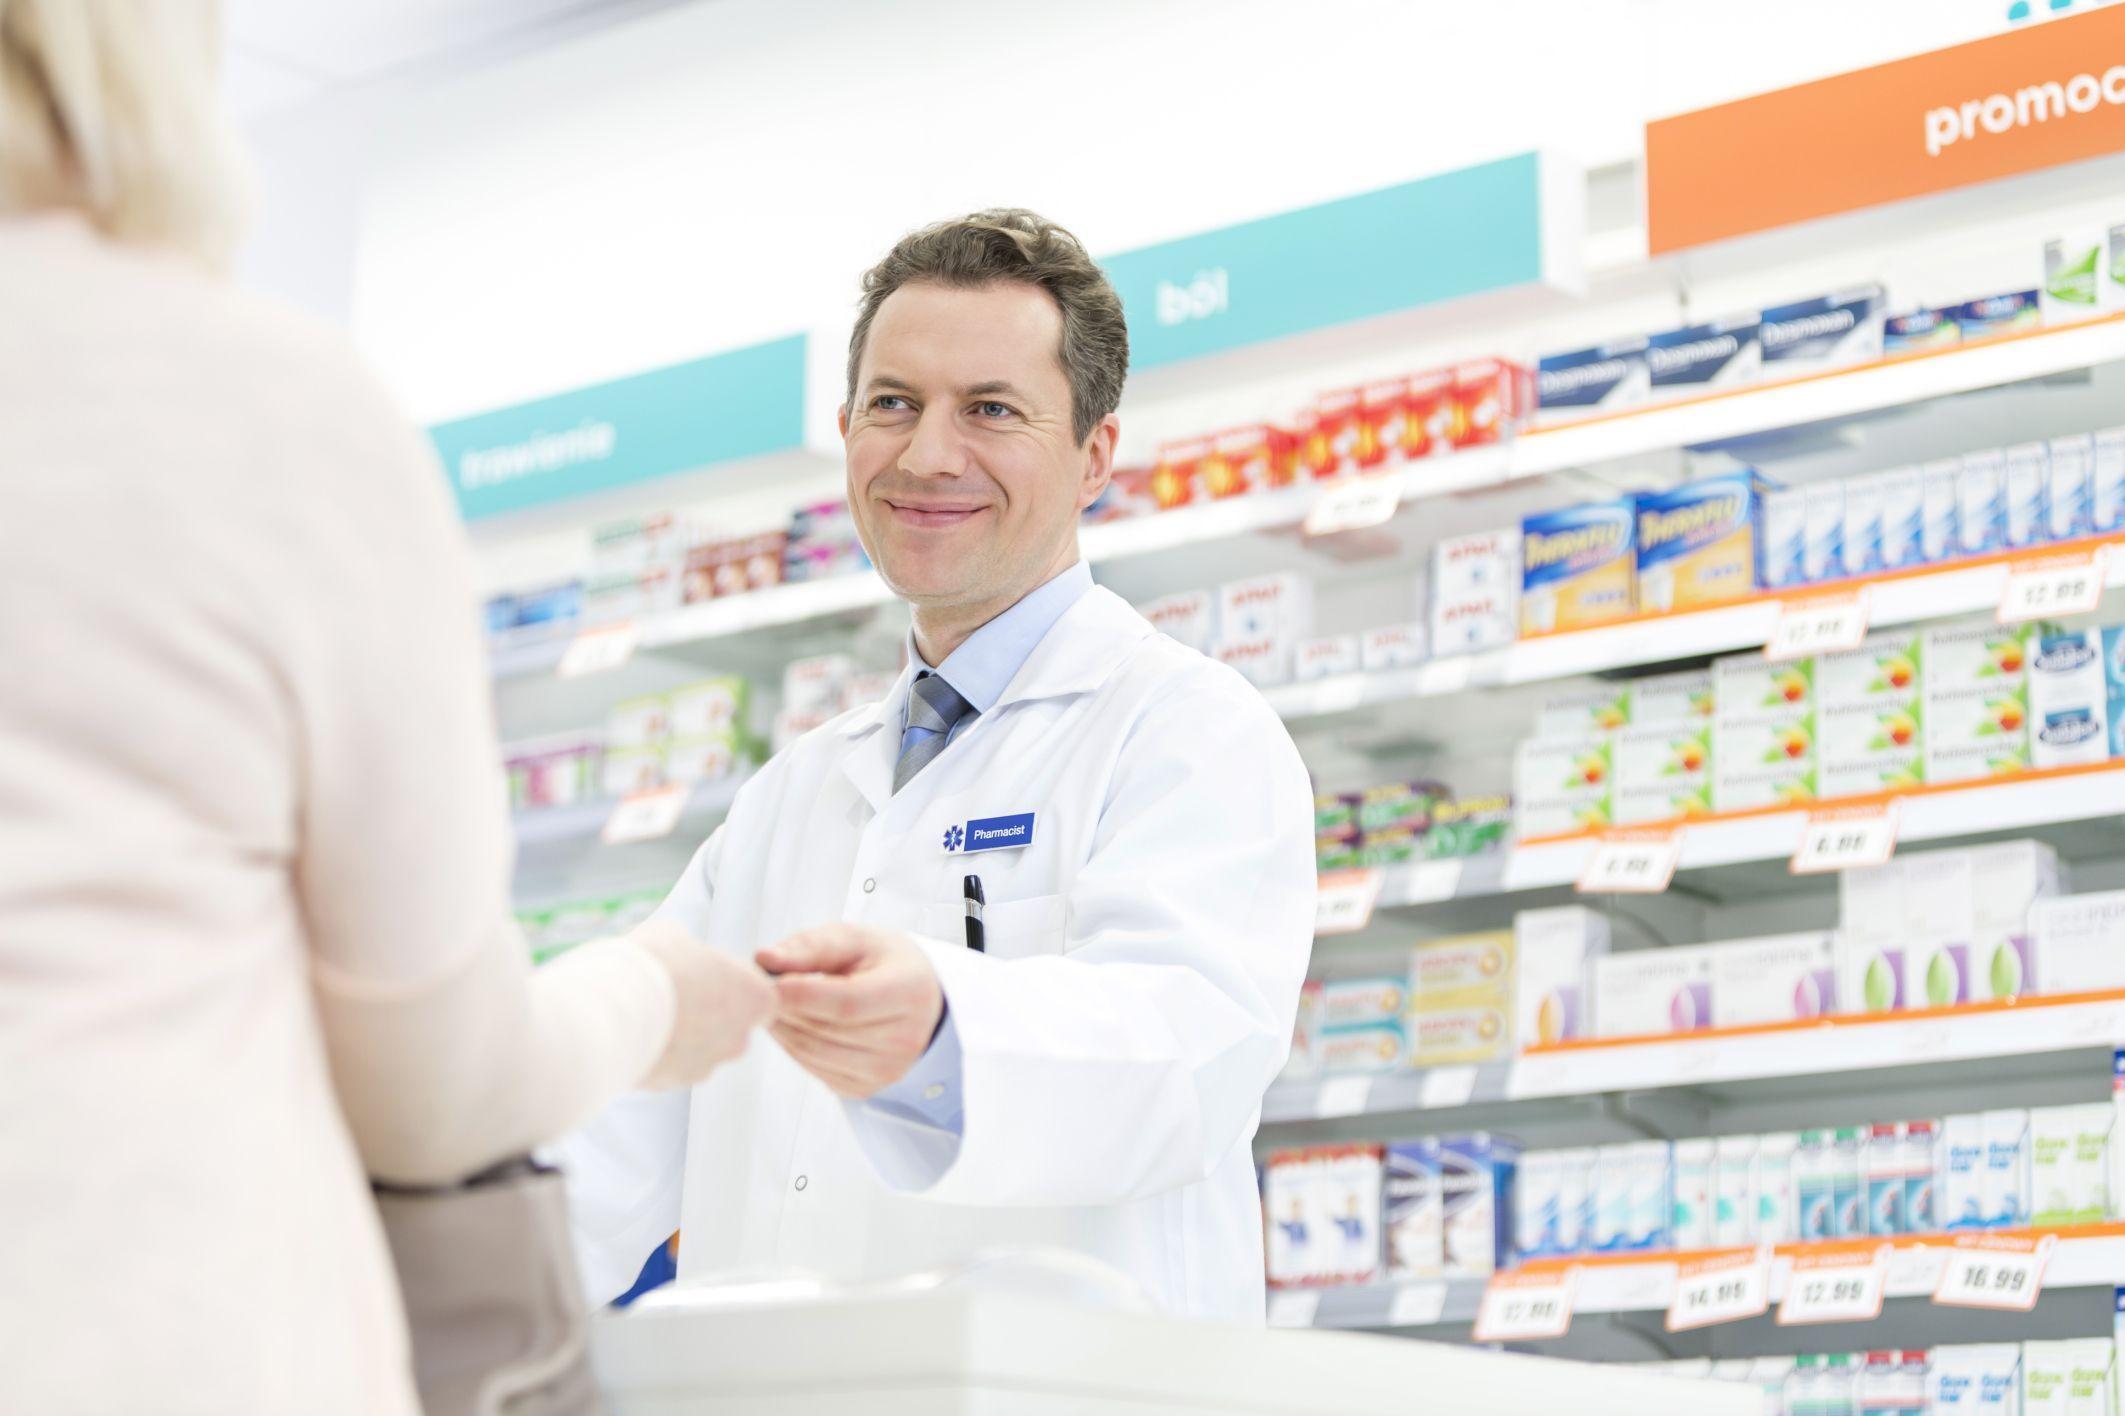 Pharmacist Job Description Salary And Skills  Job Description